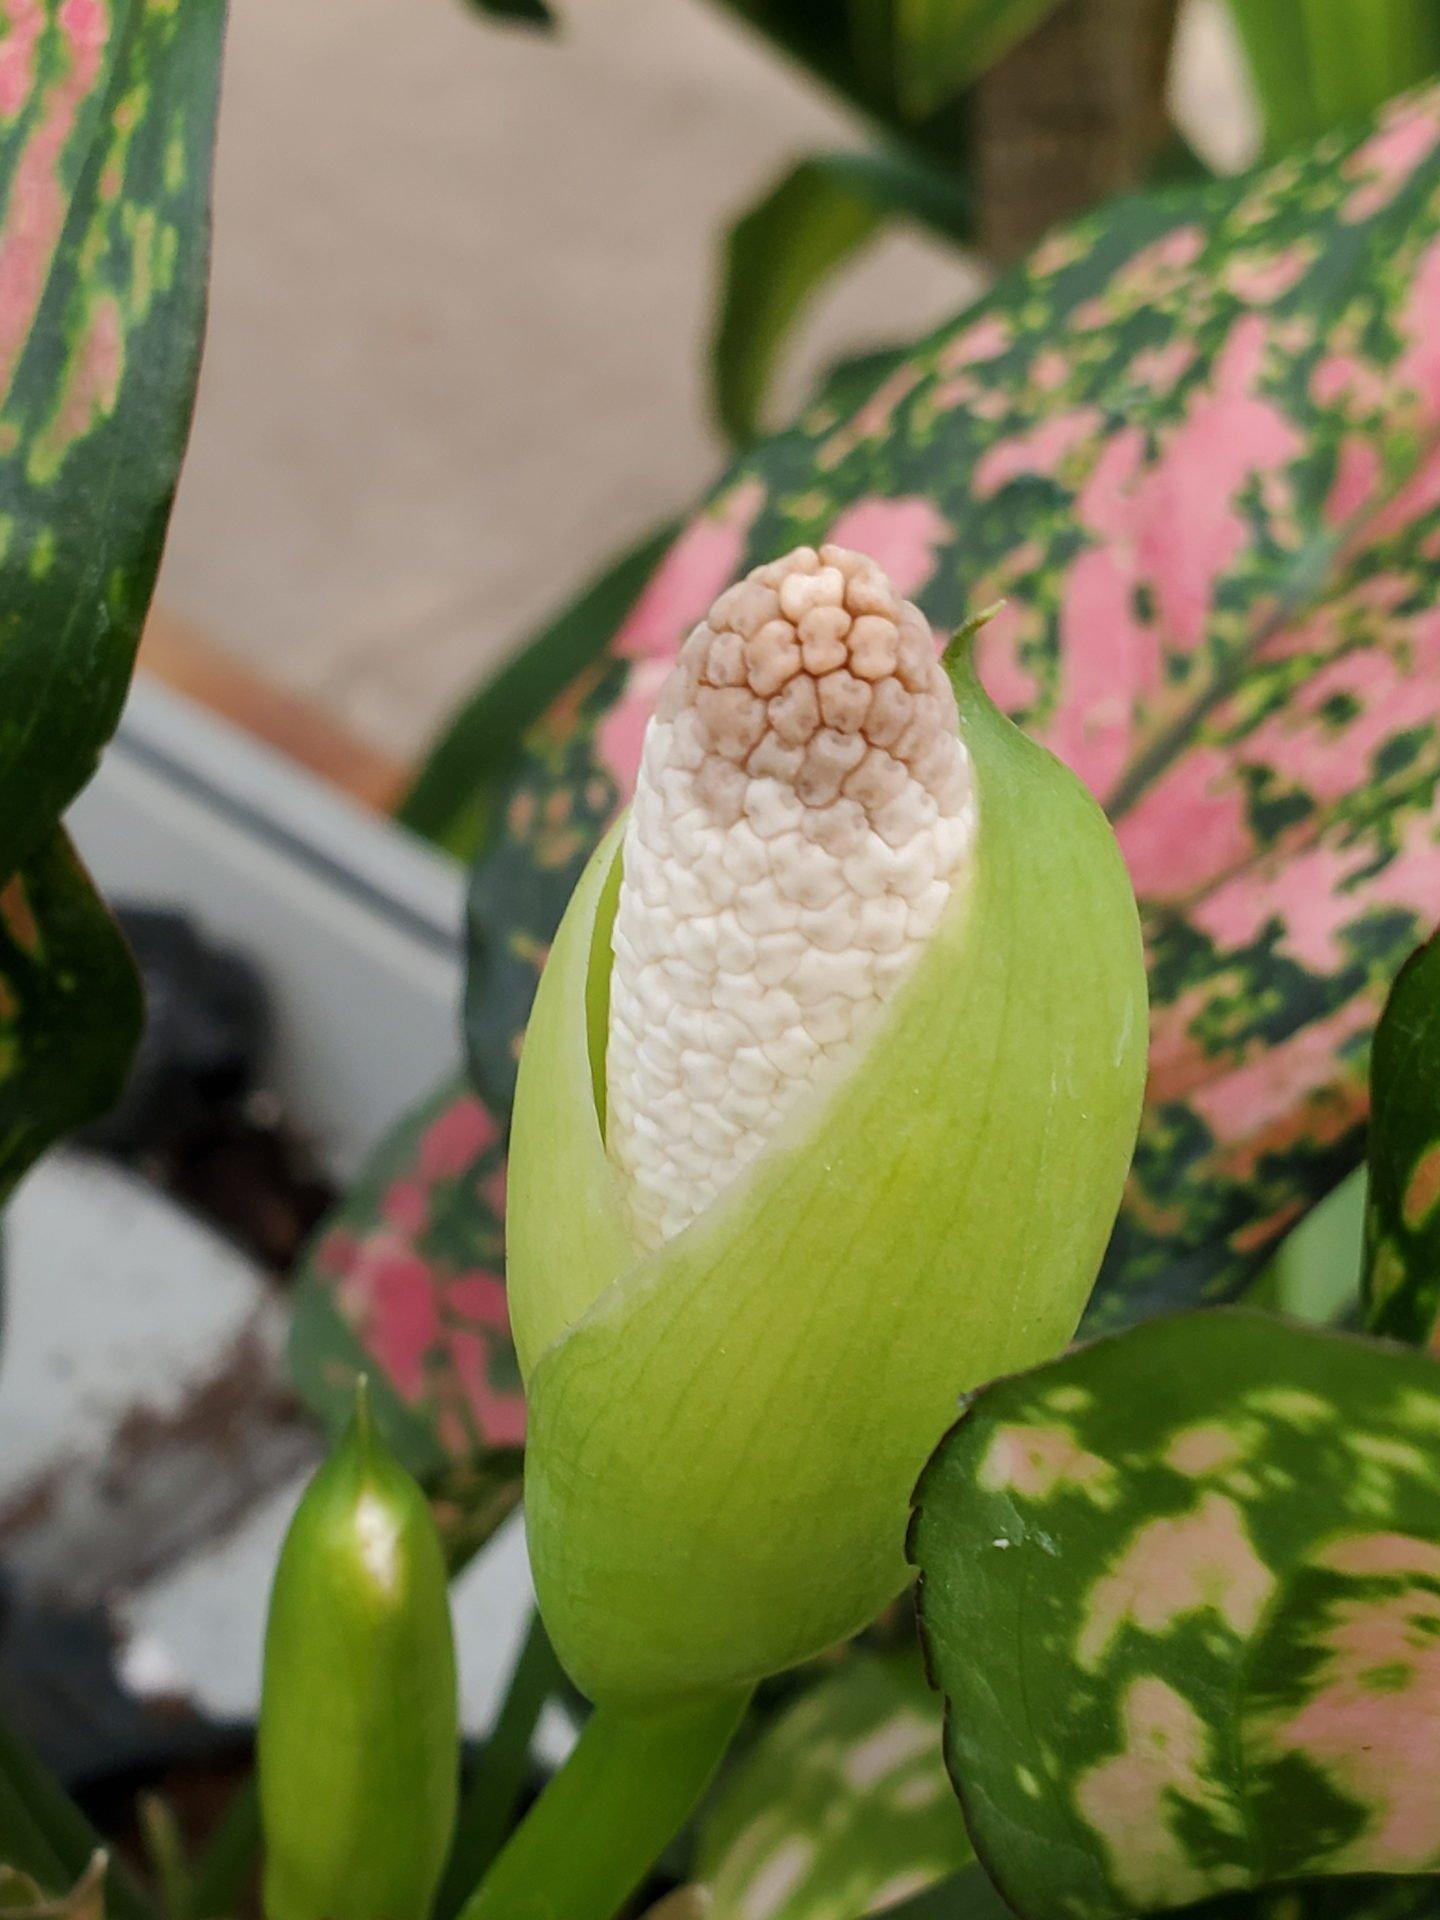 Aglaonema flower